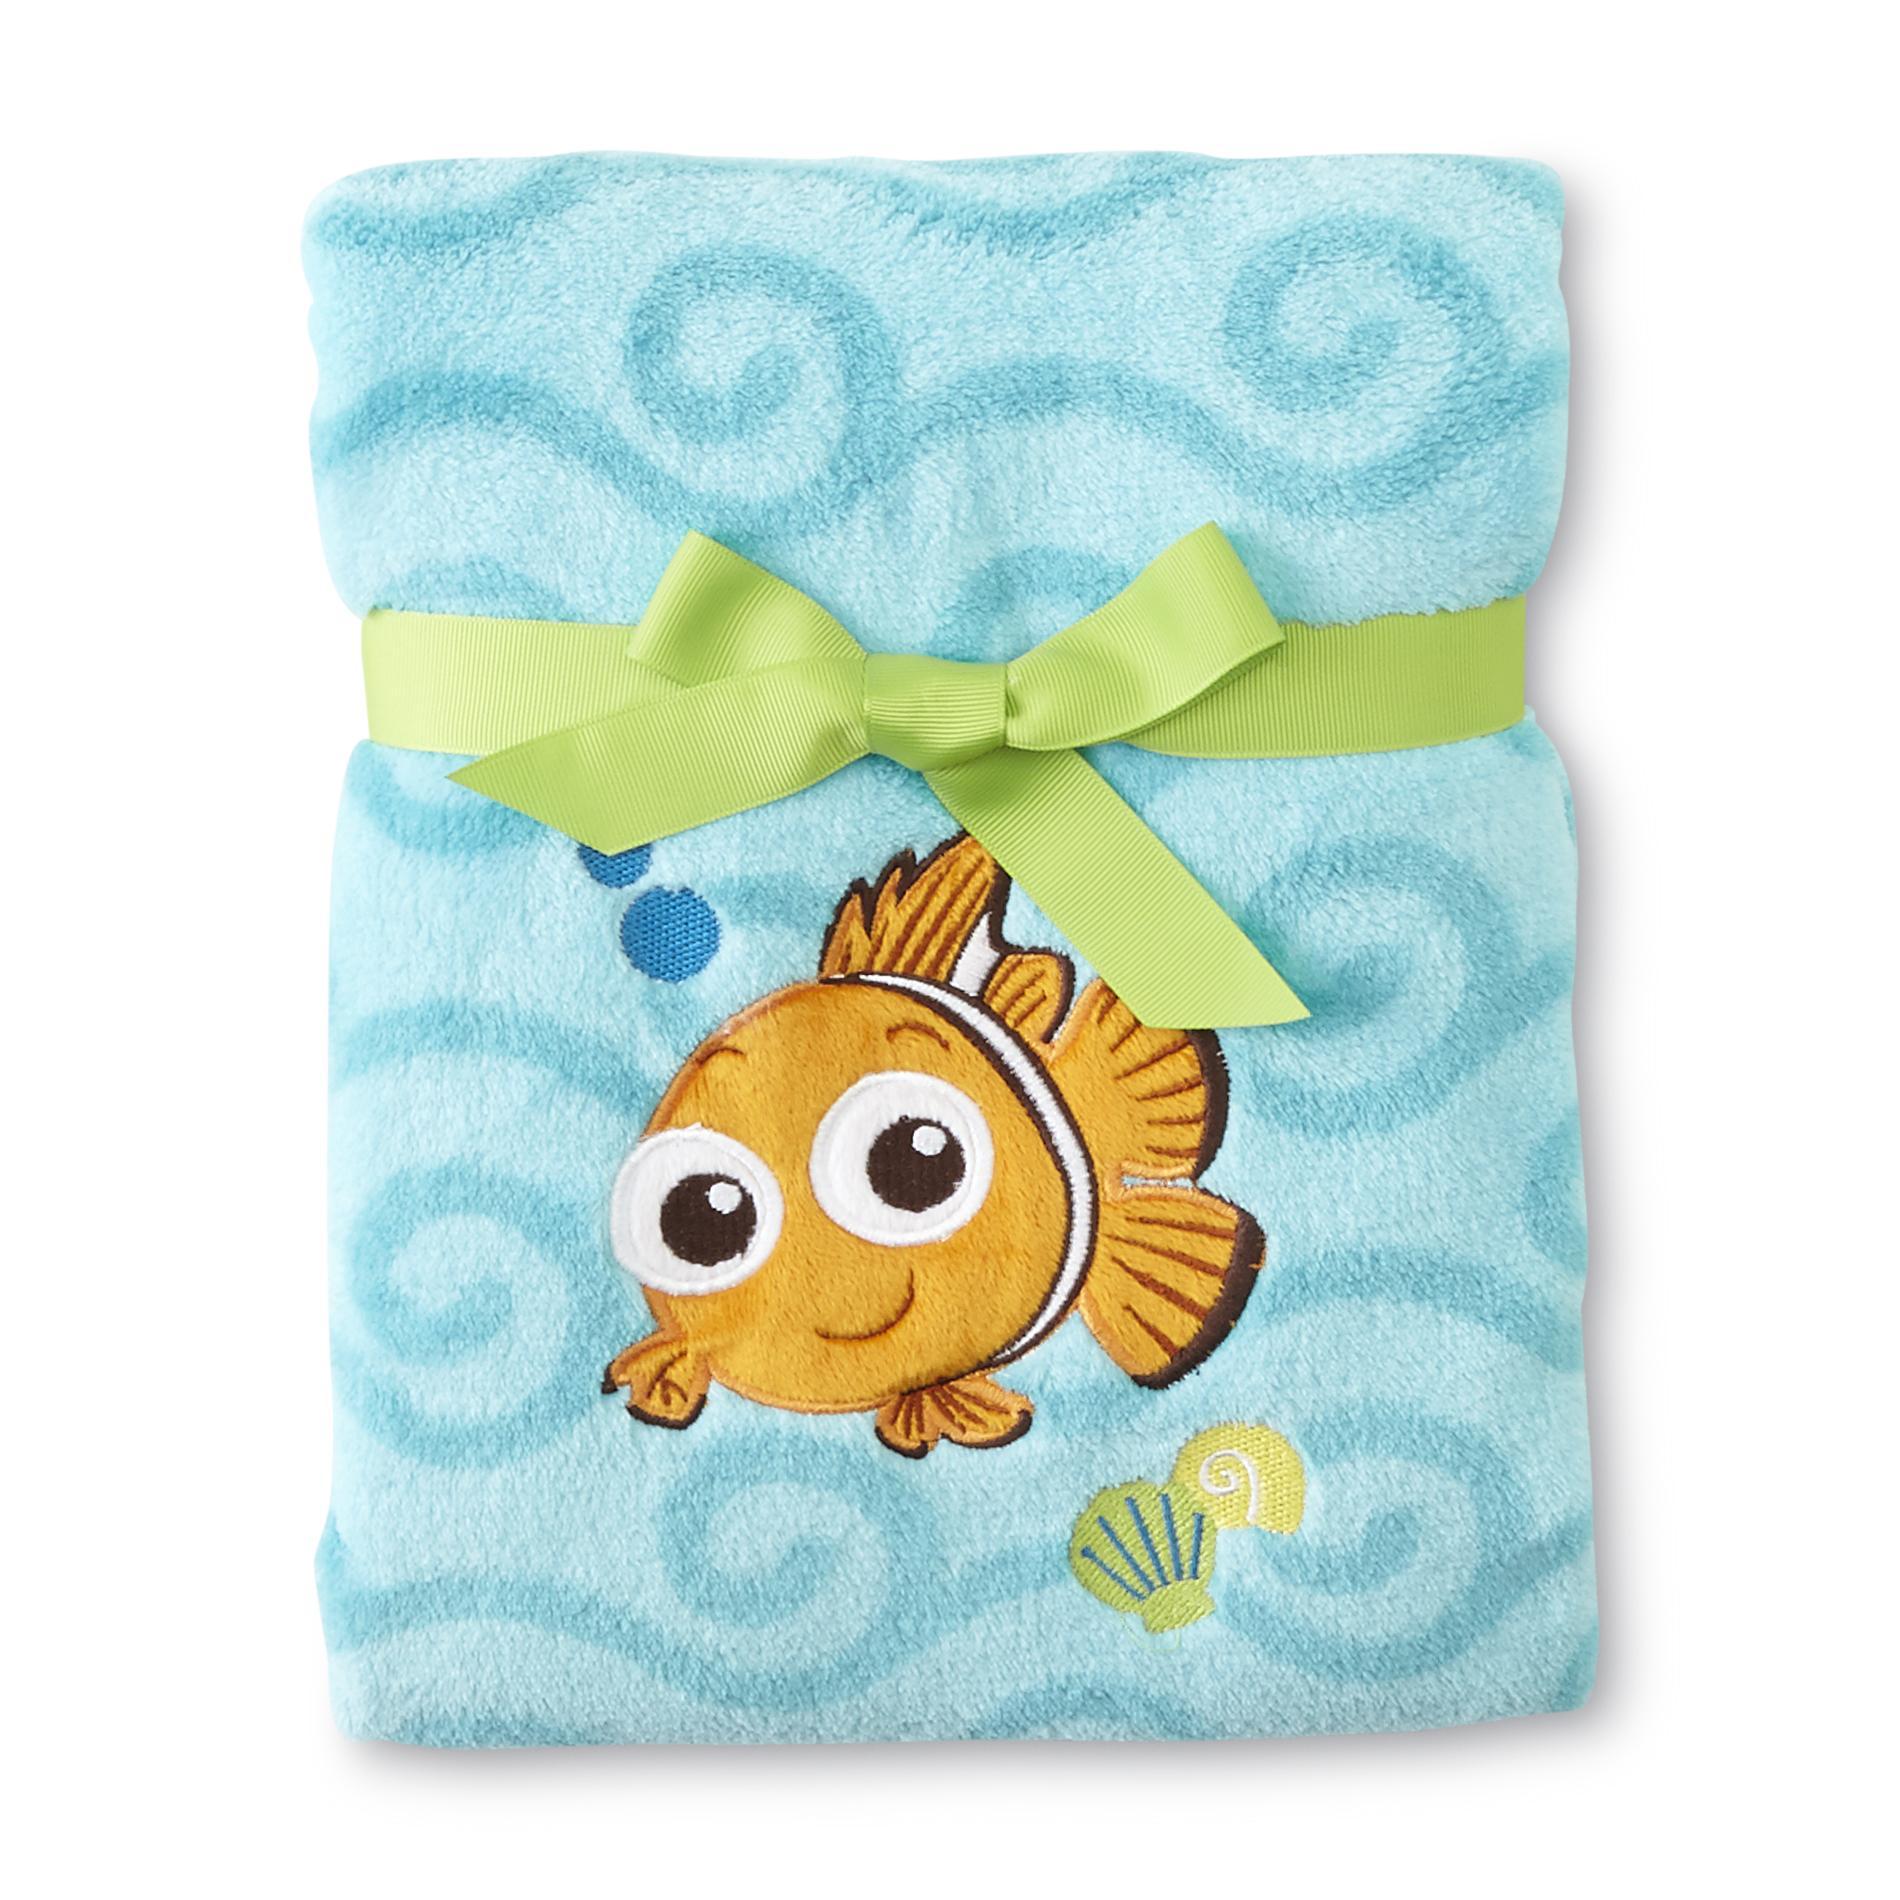 Disney Baby Finding Nemo Infant' Fleece Blanket